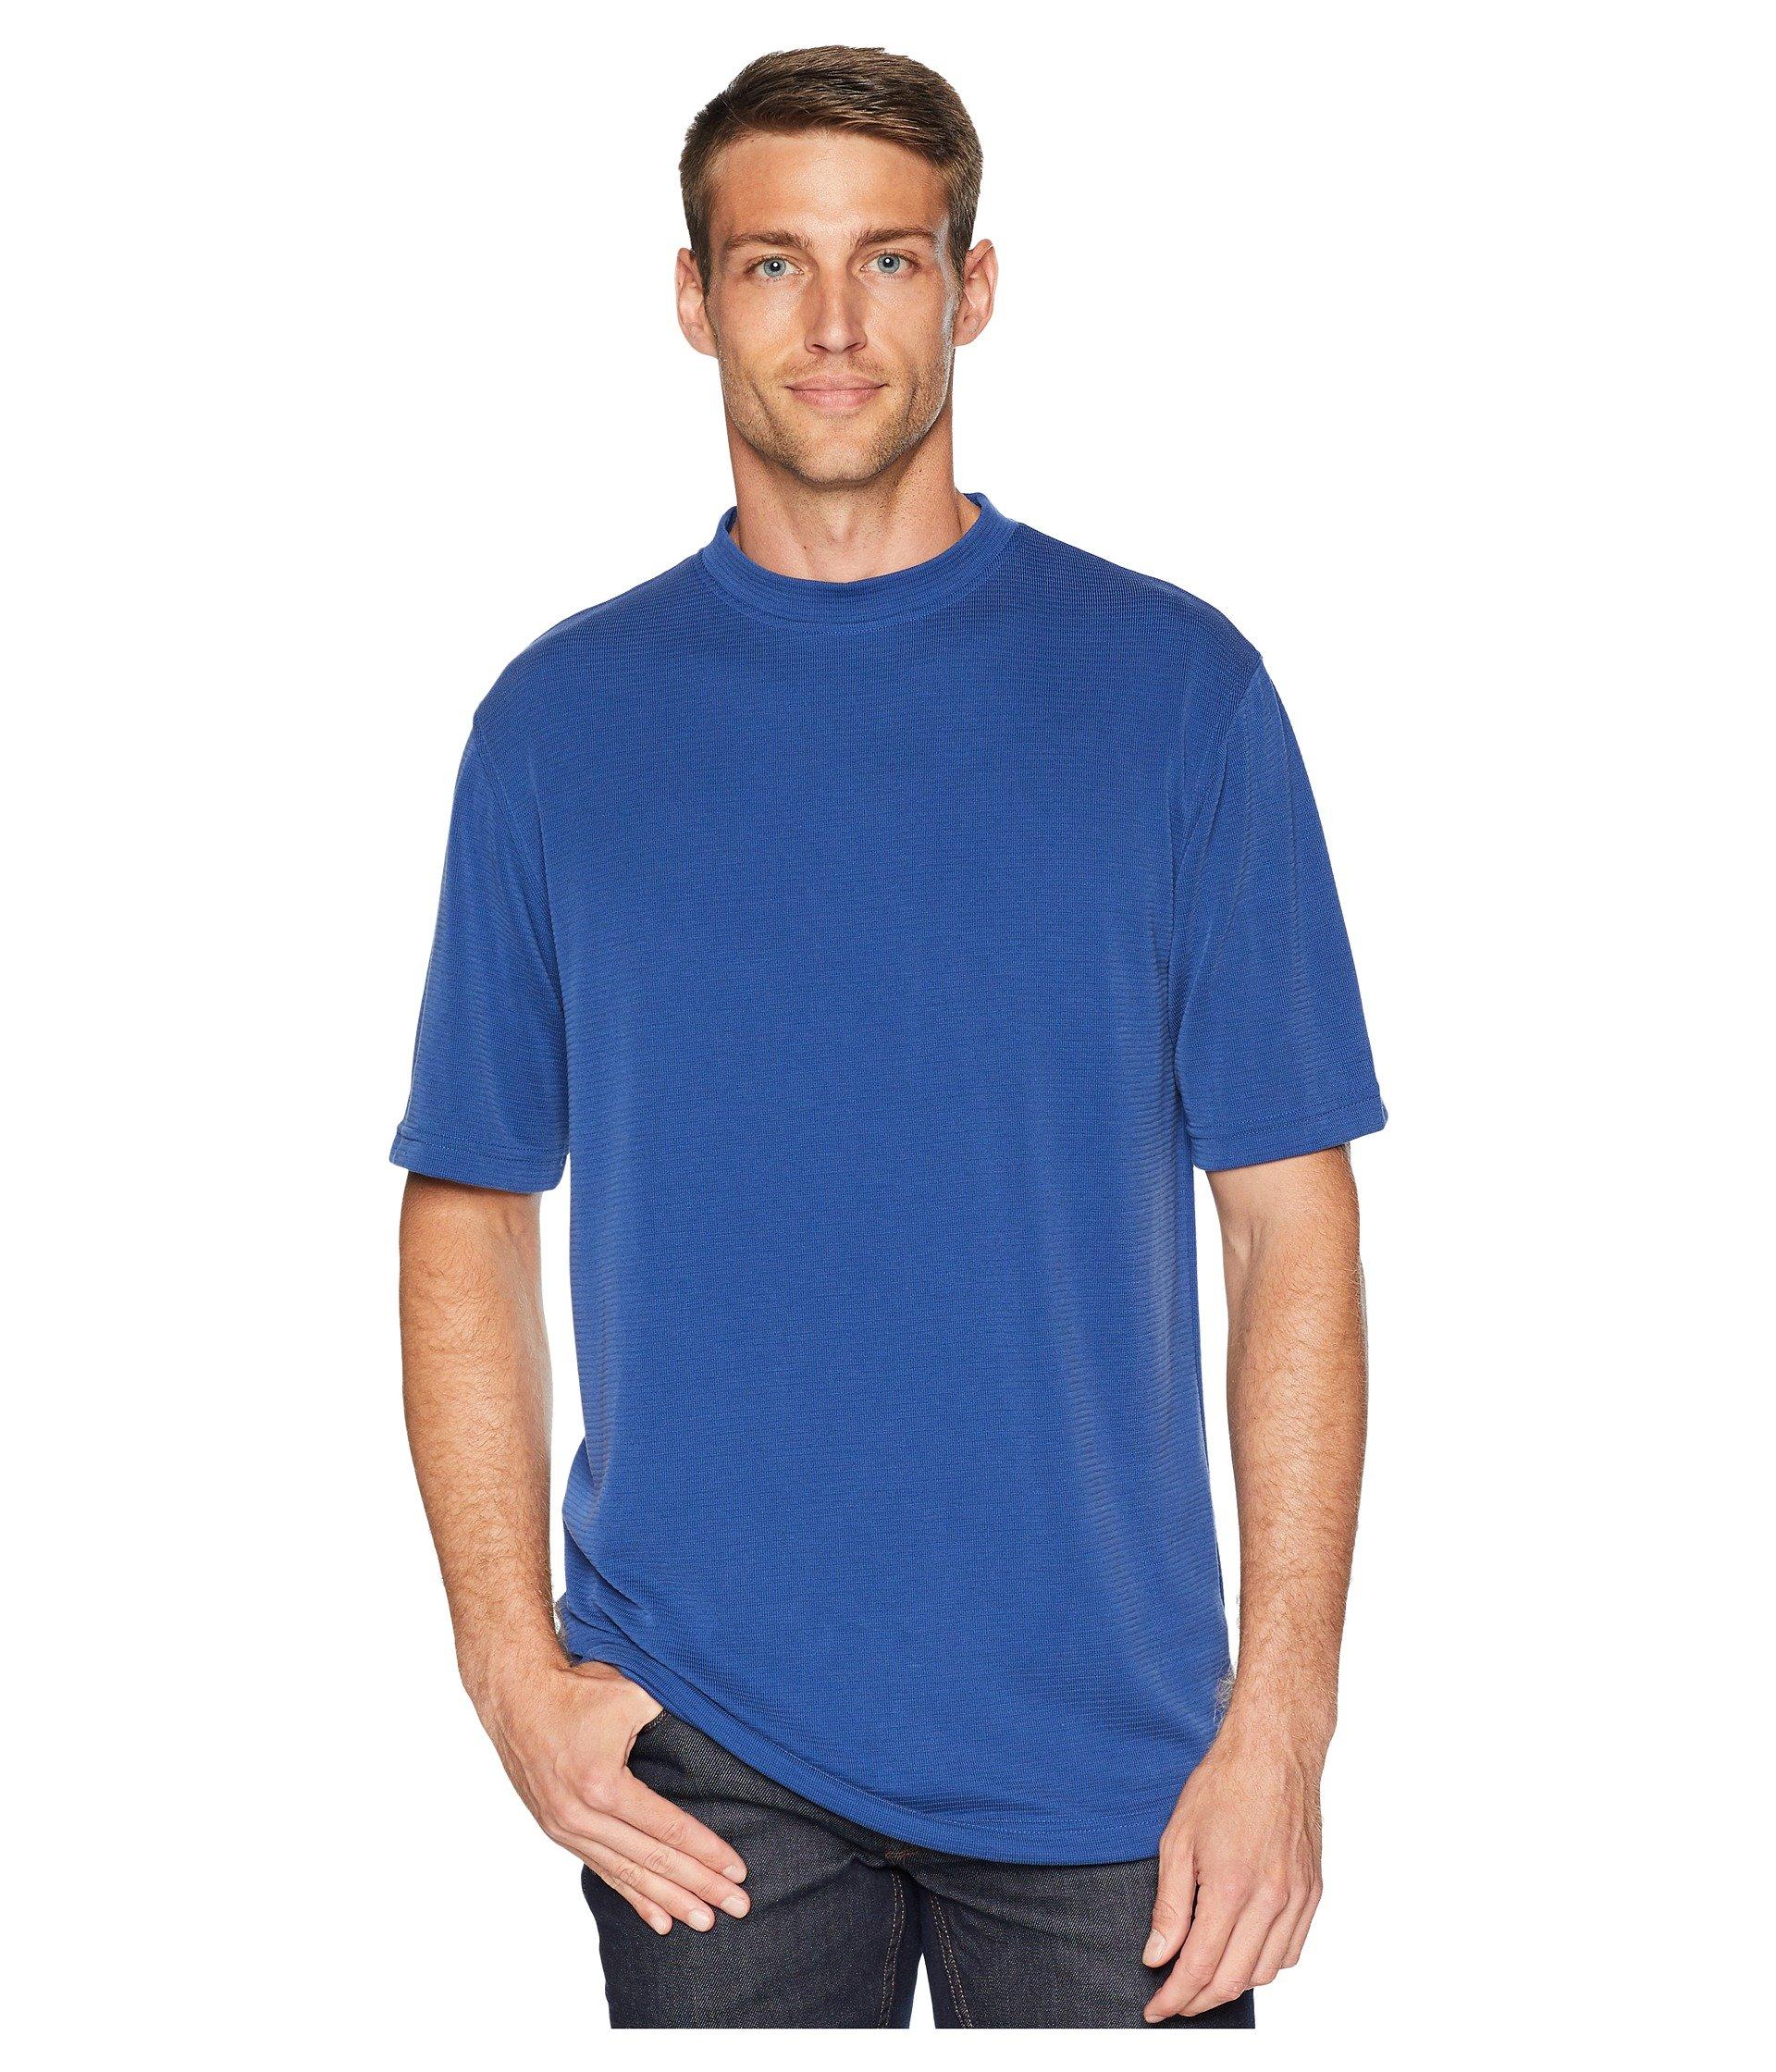 blend Textured Modal Crew shirt T Navy Bugatchi 0Eq1Rwn0